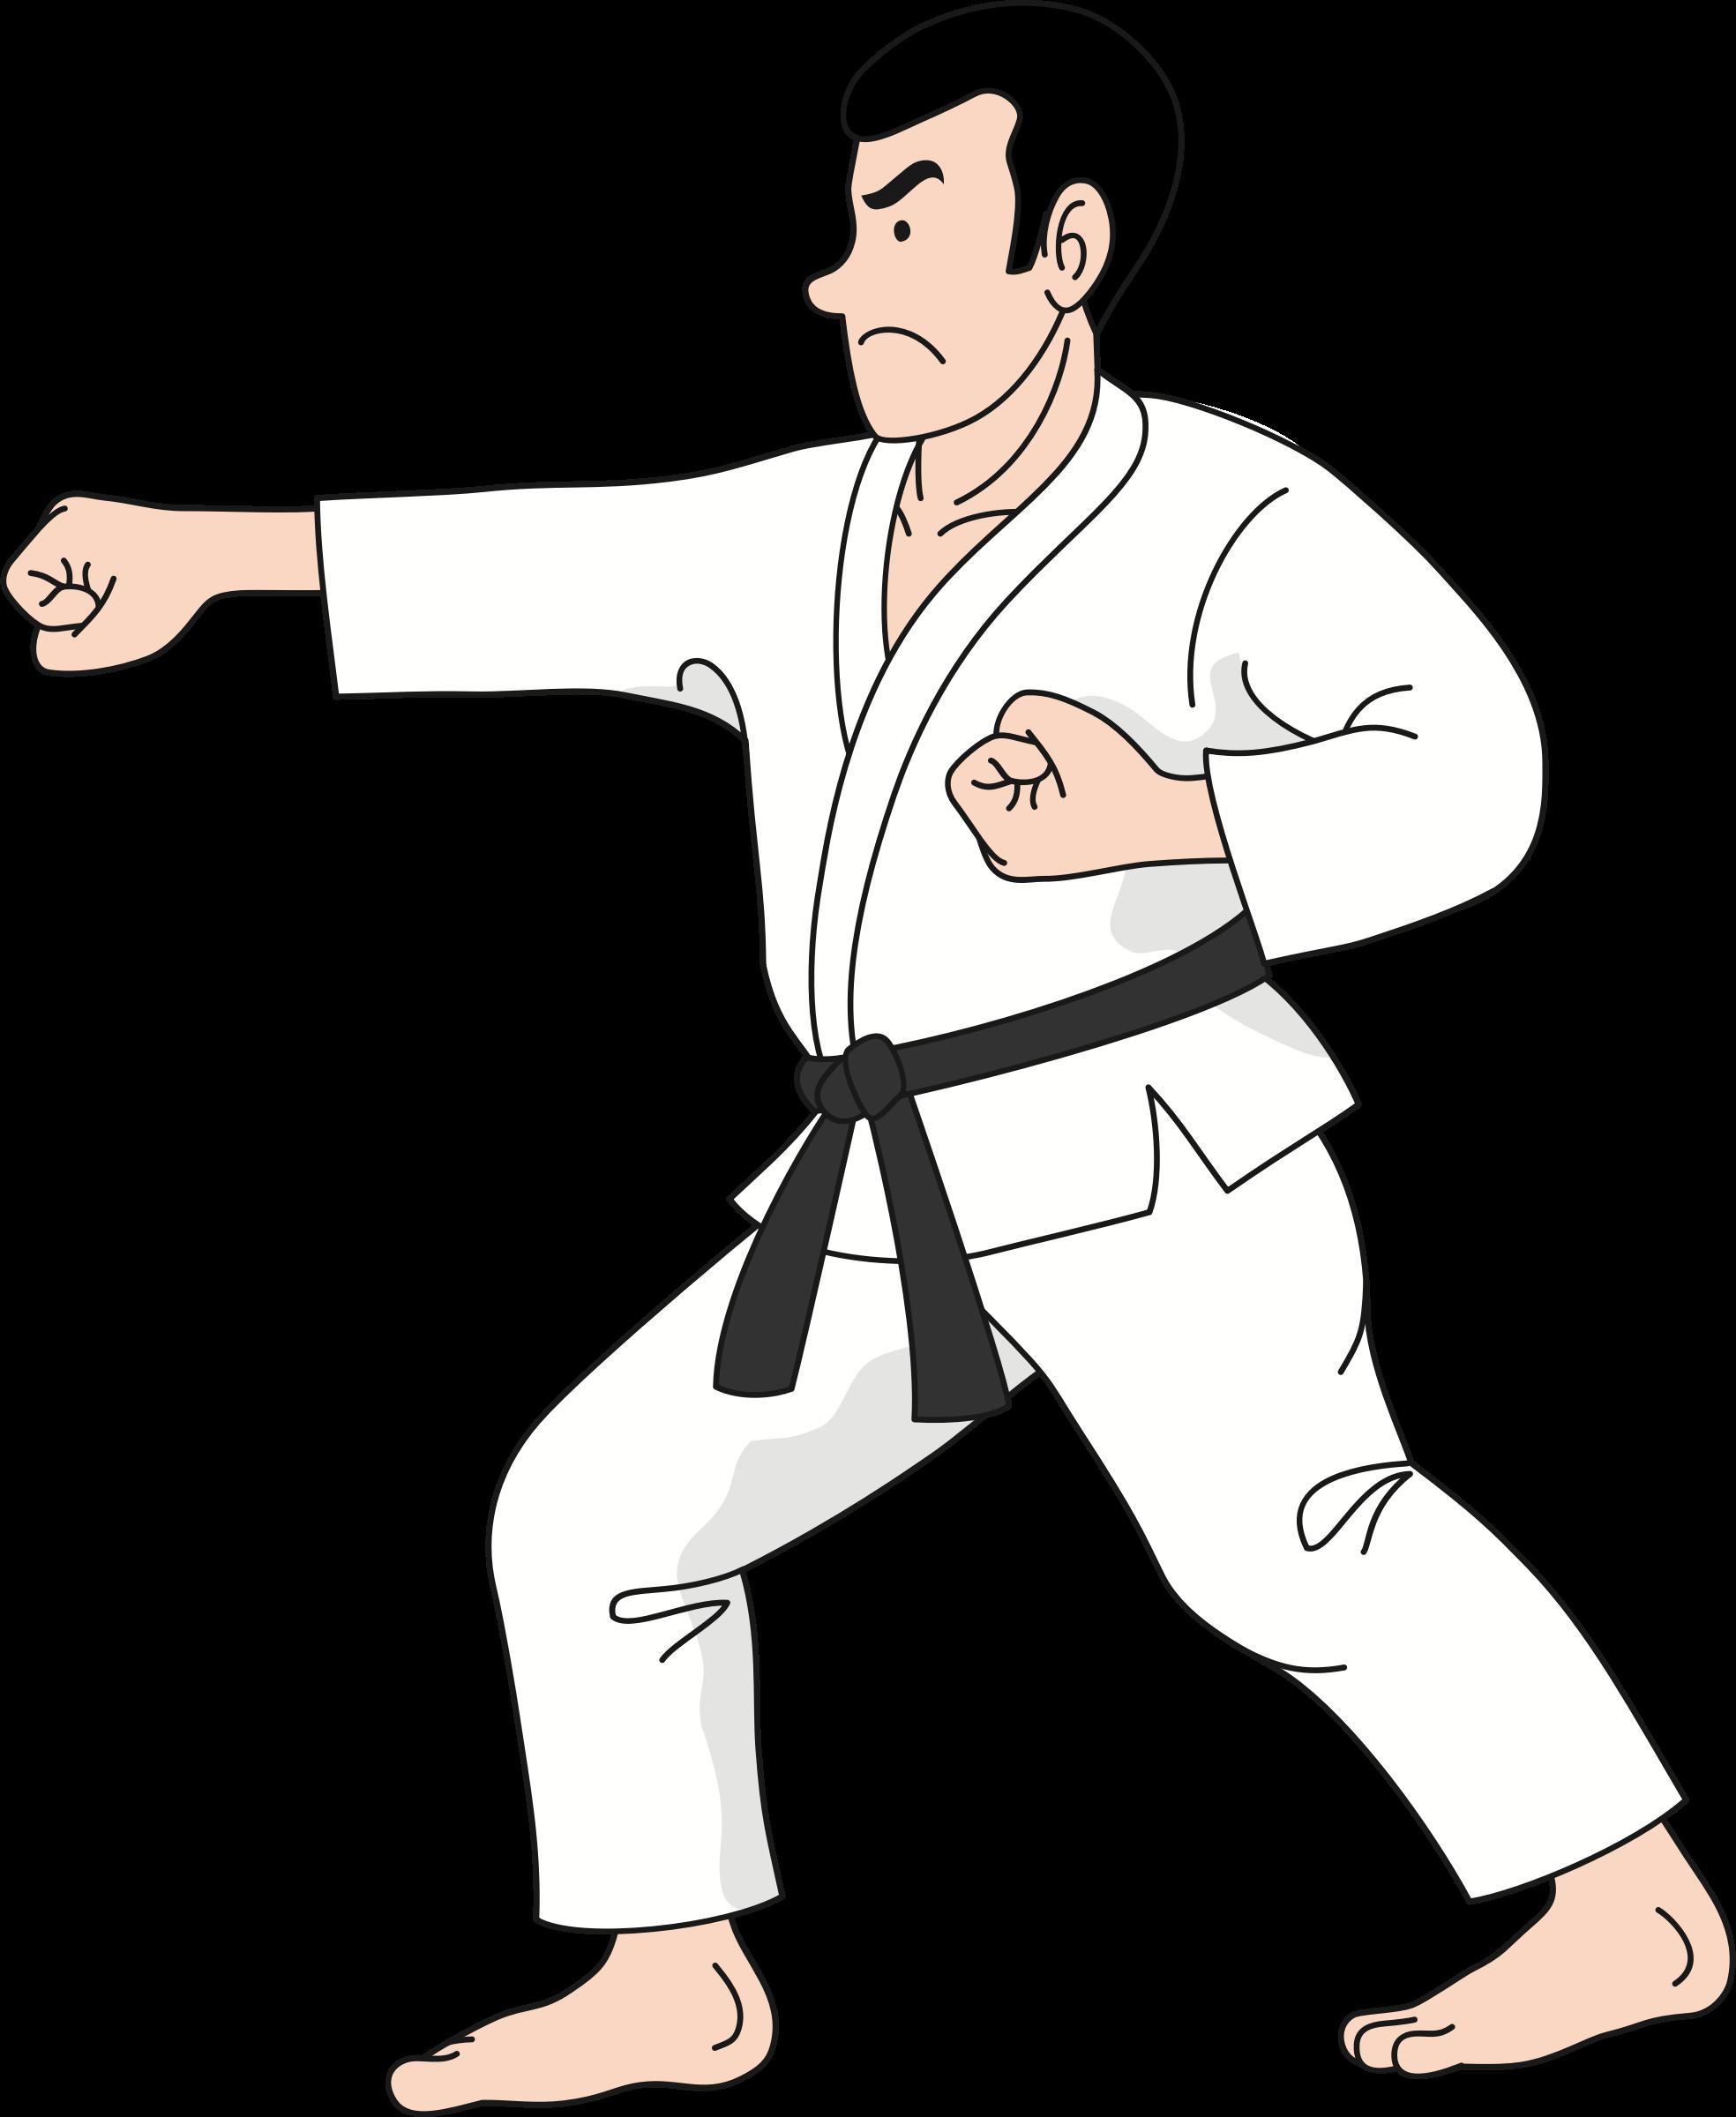 Karate big image png. Computer clipart practice